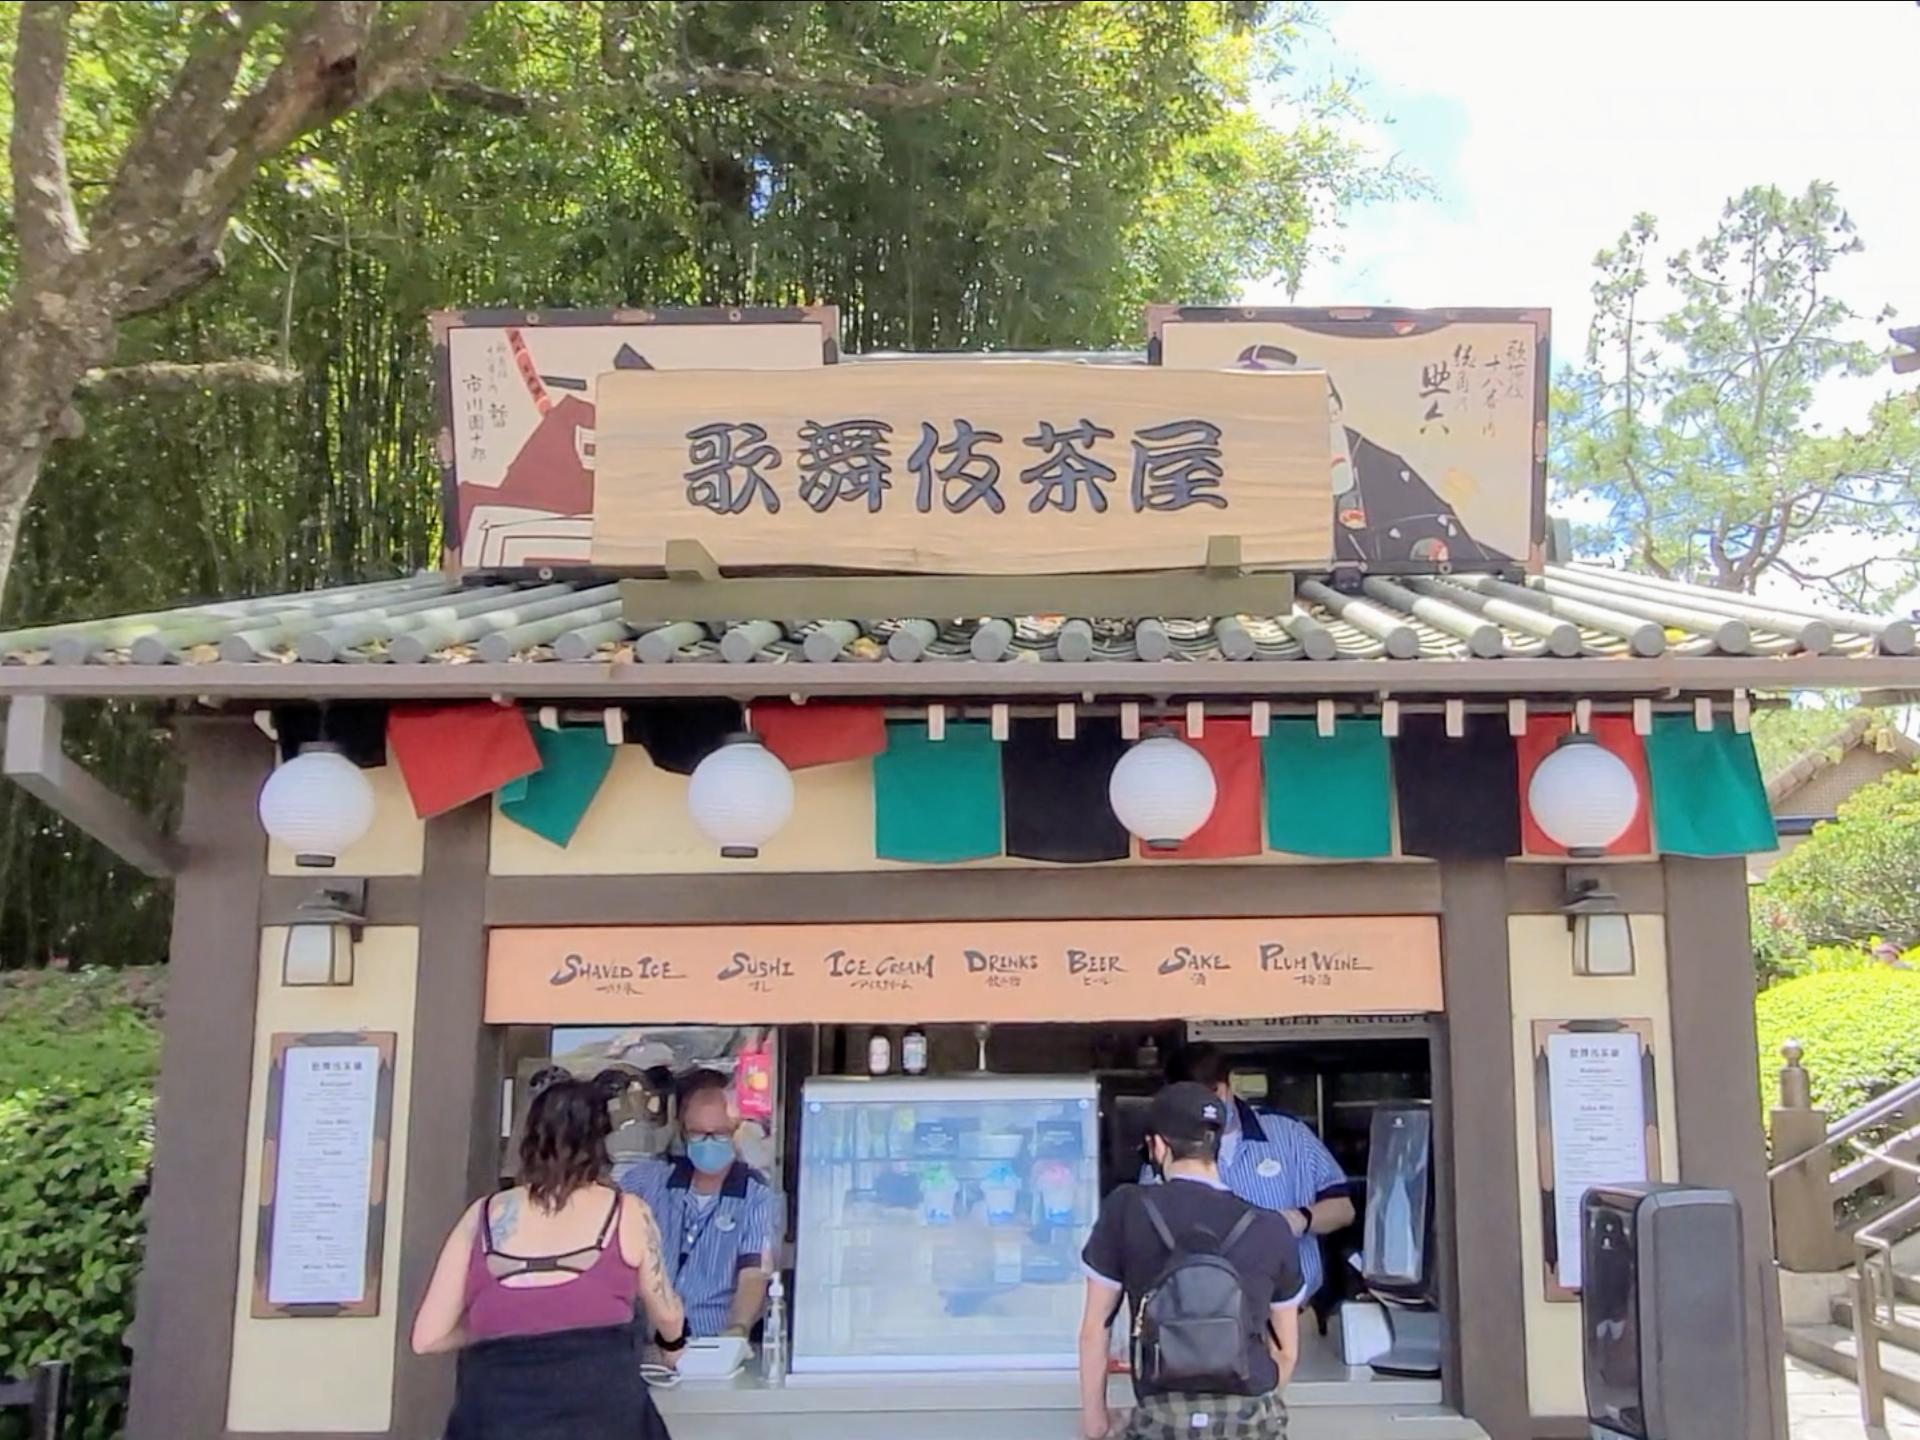 Kabuki Cafe at Disney's Epcot